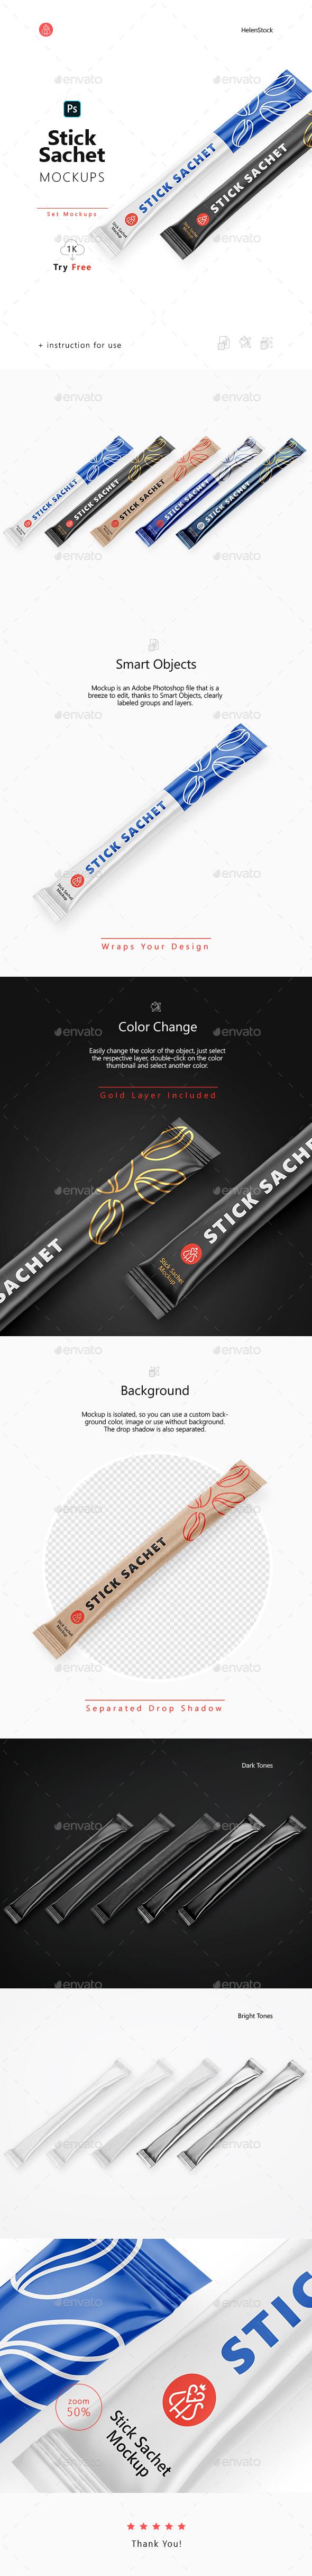 Stick Sachet Mockup Set – Half side View